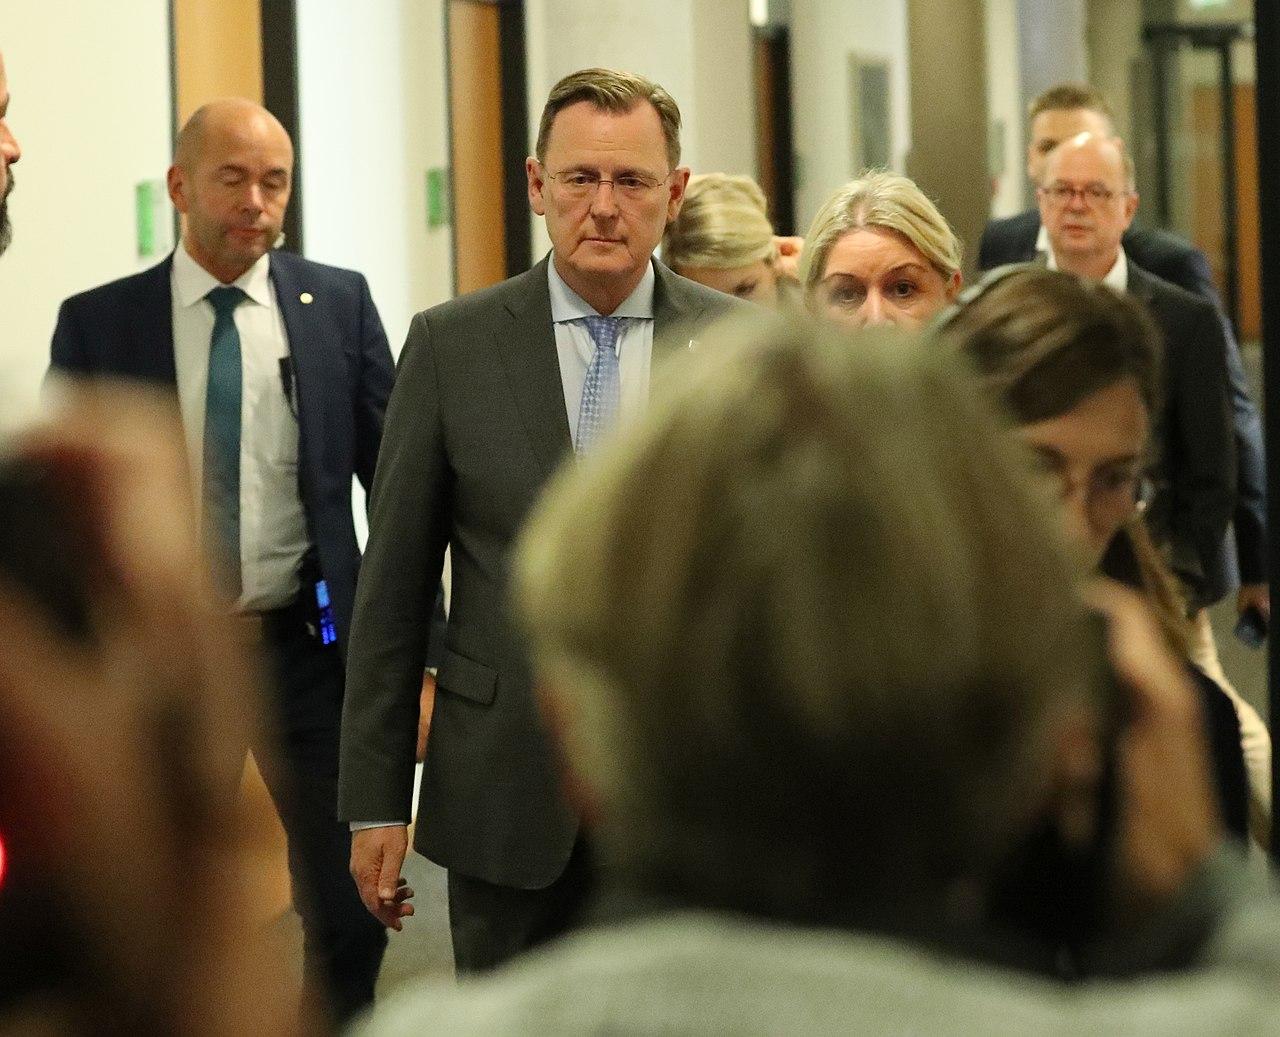 2019-10-27 Wahlabend Thüringen by Sandro Halank–09.jpg